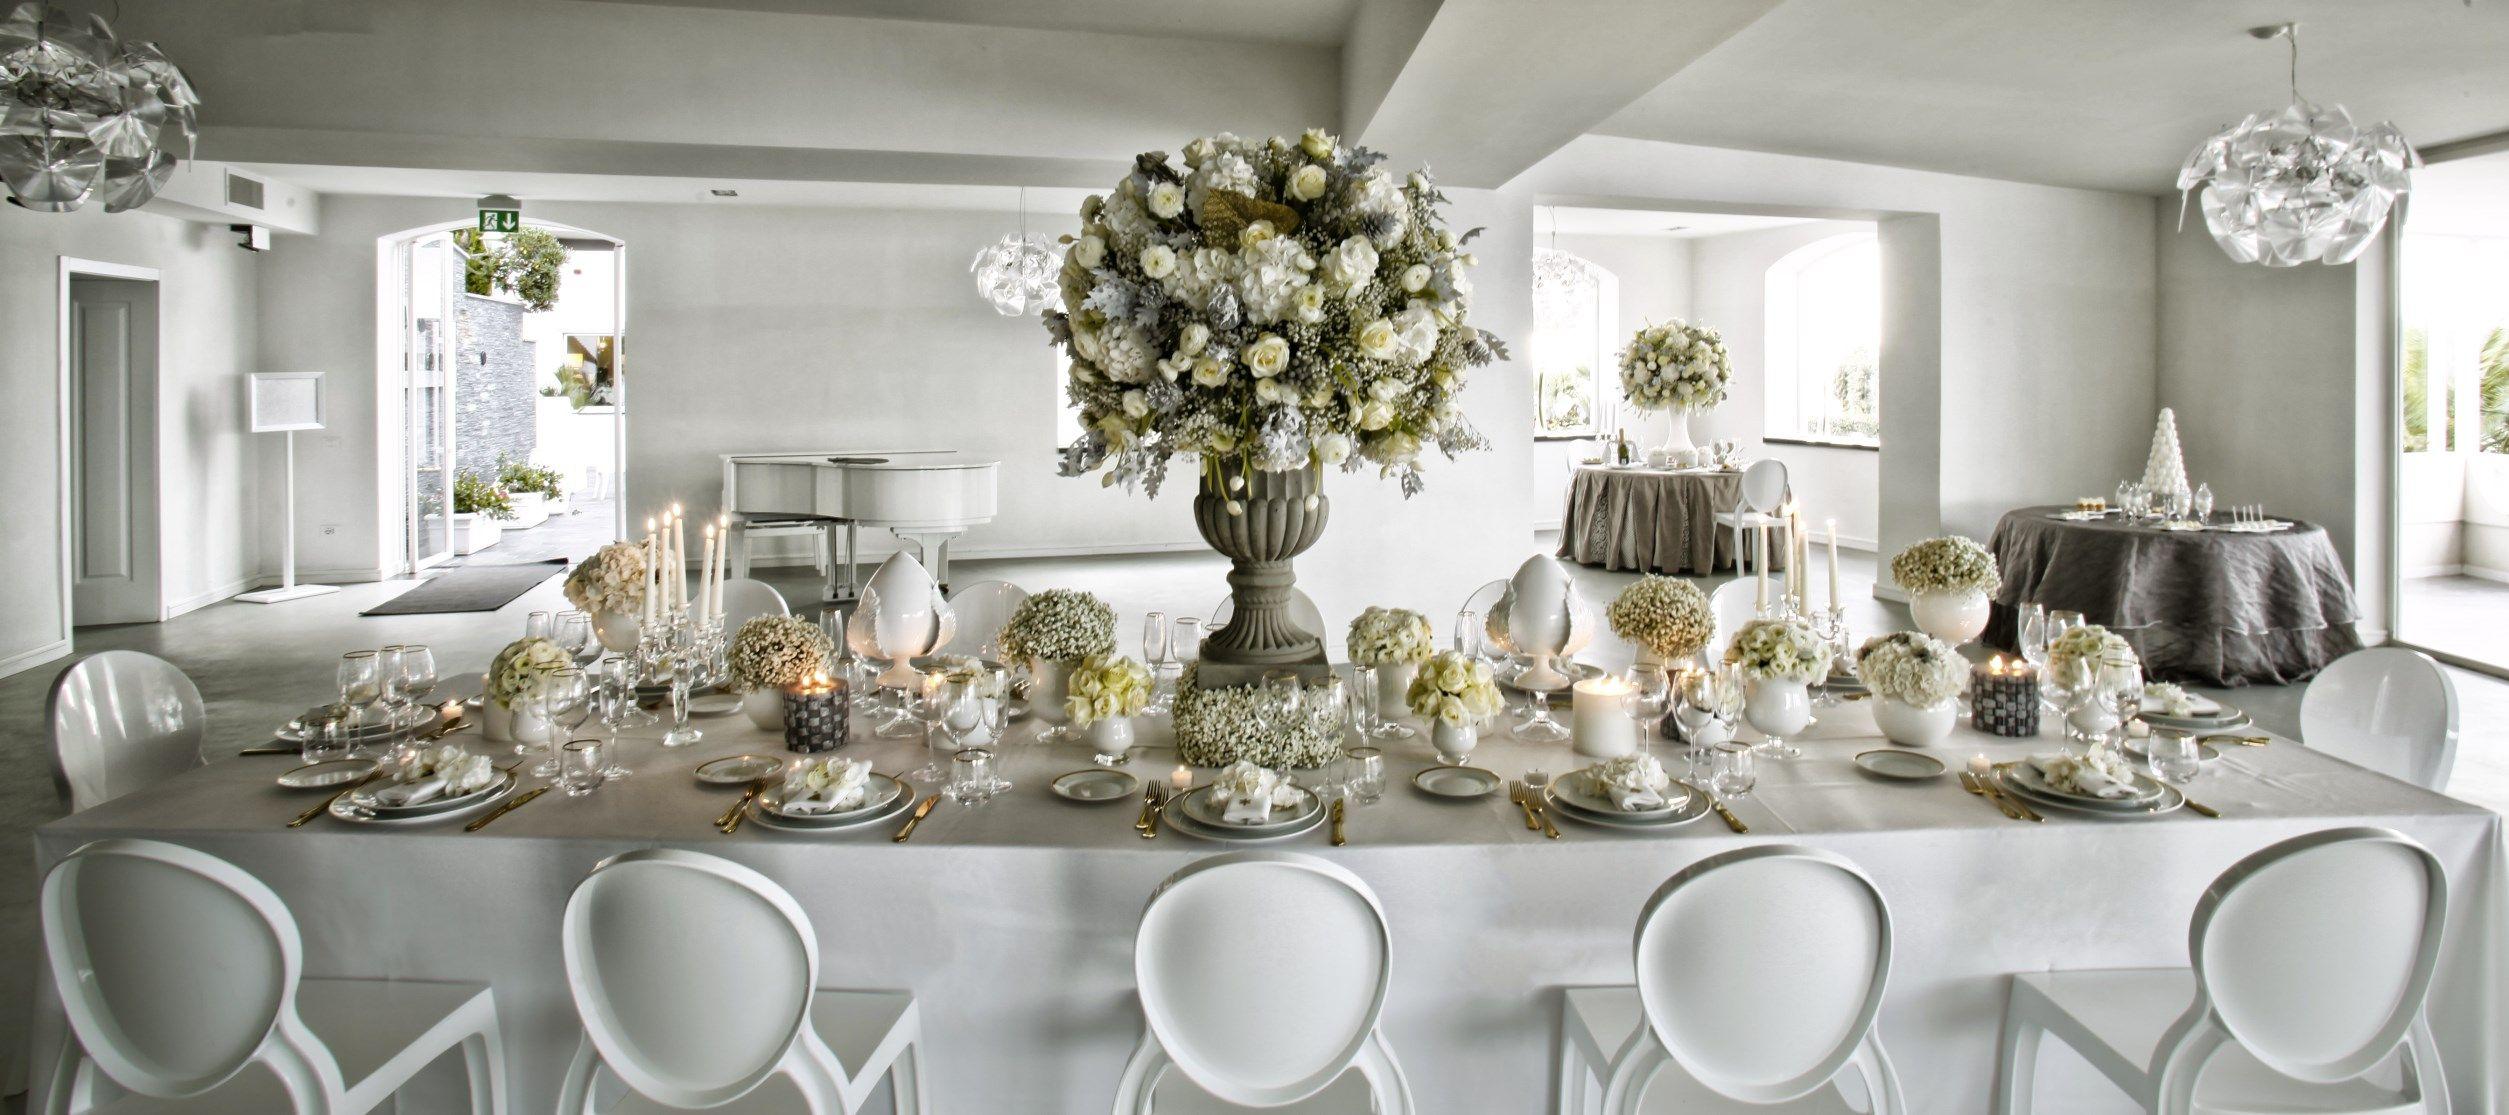 Matrimonio Tema Inverno : Tavolo imperiale tema invernale calamoresca.it wedding tavolo